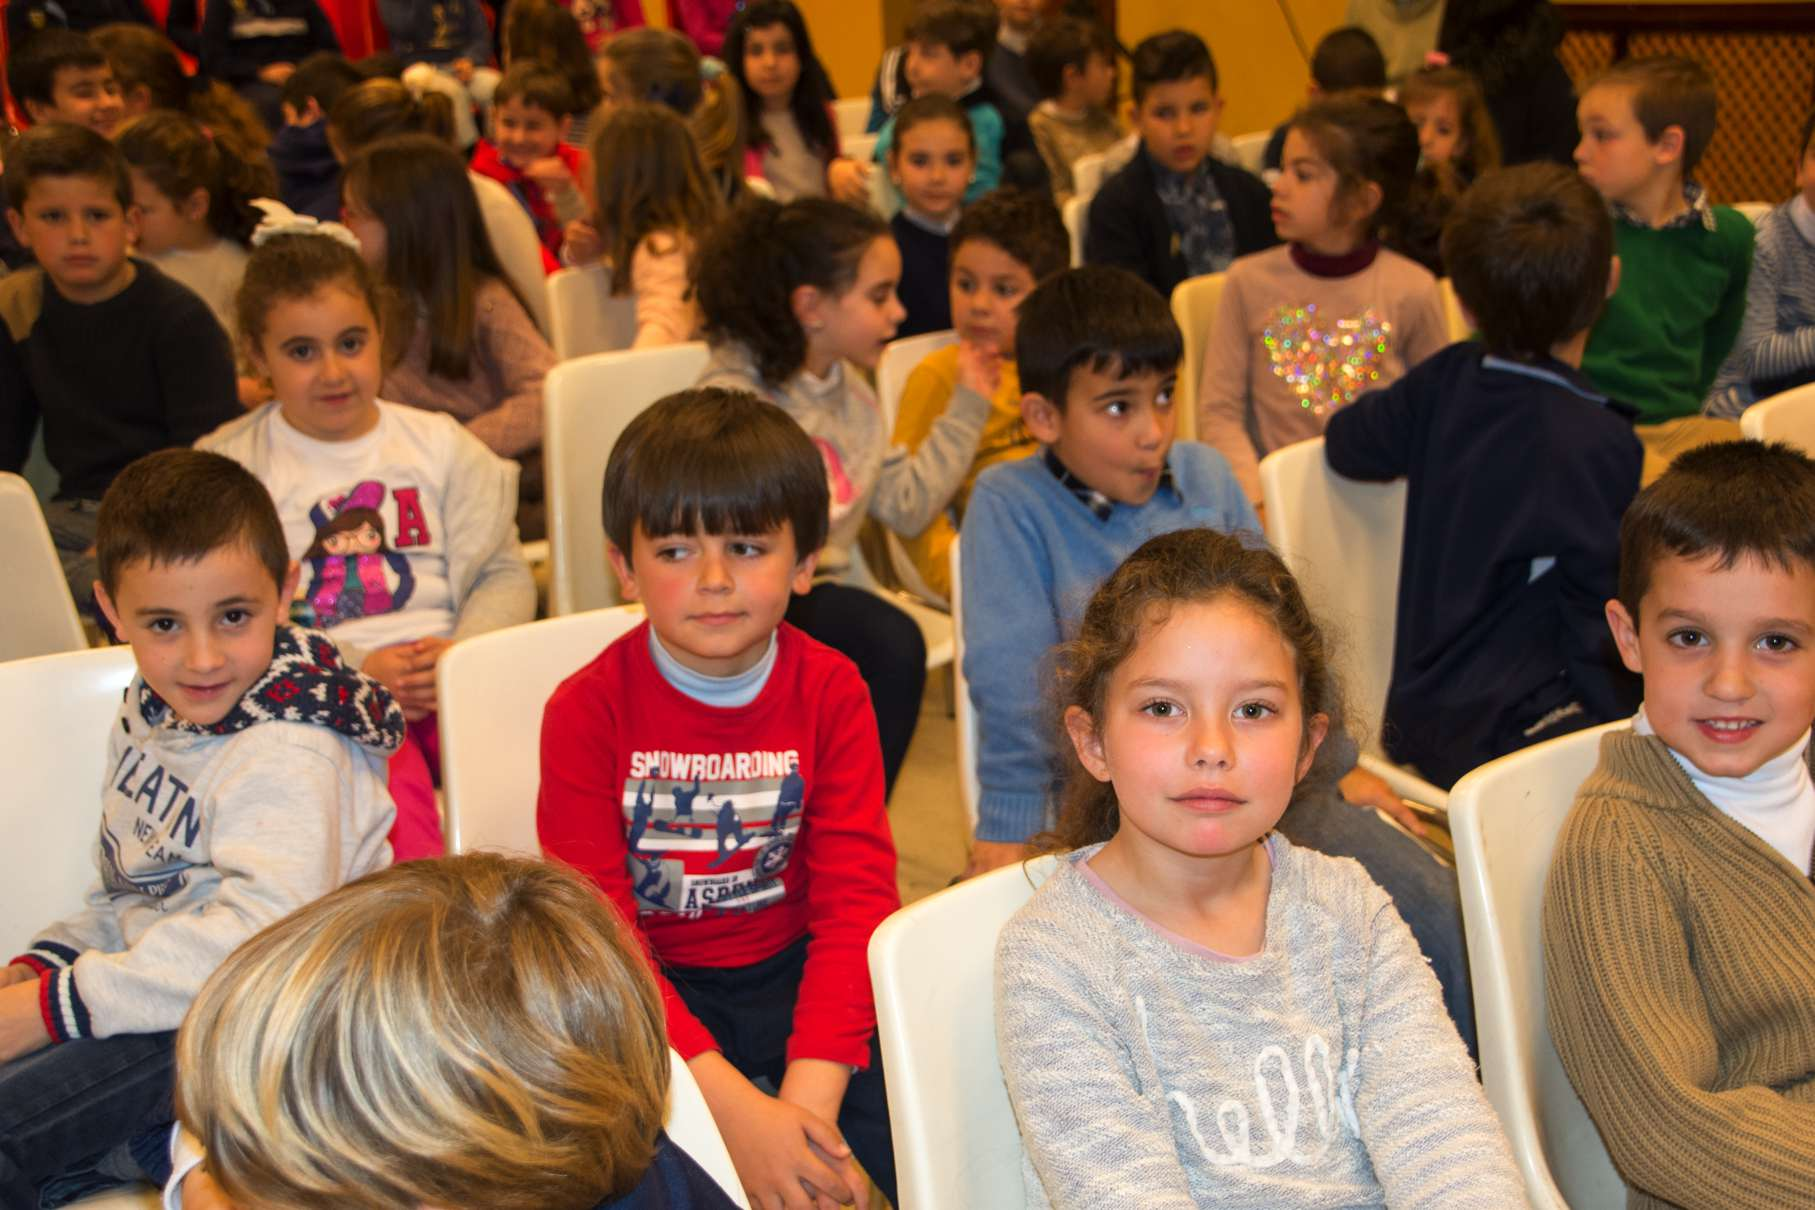 2016-02-10_MiércolesdeCeniza_000